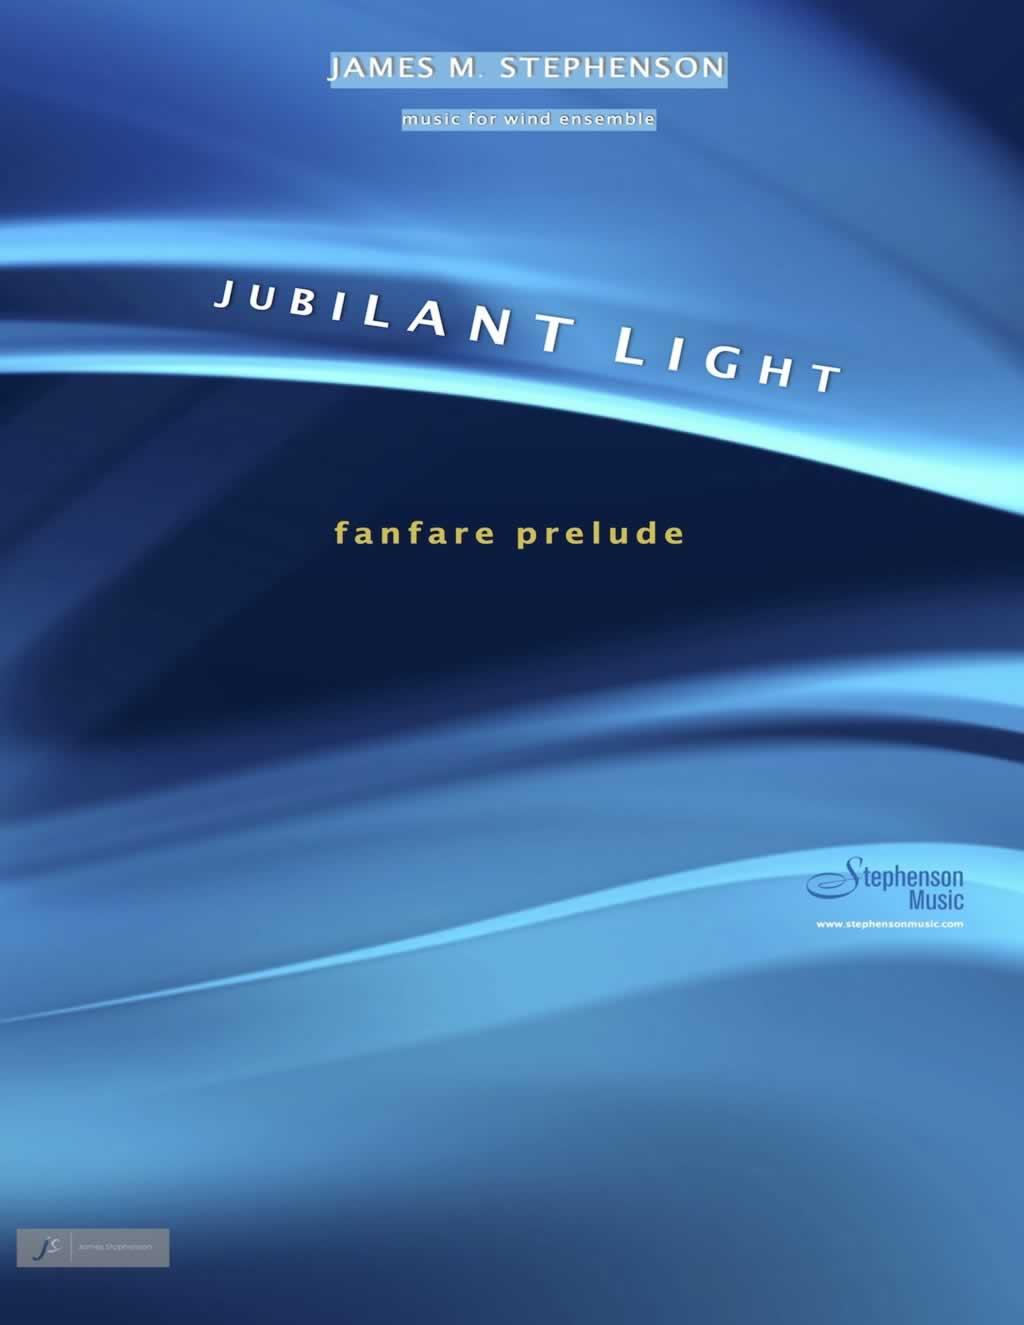 Jubilant Light and Fanfare Prelude